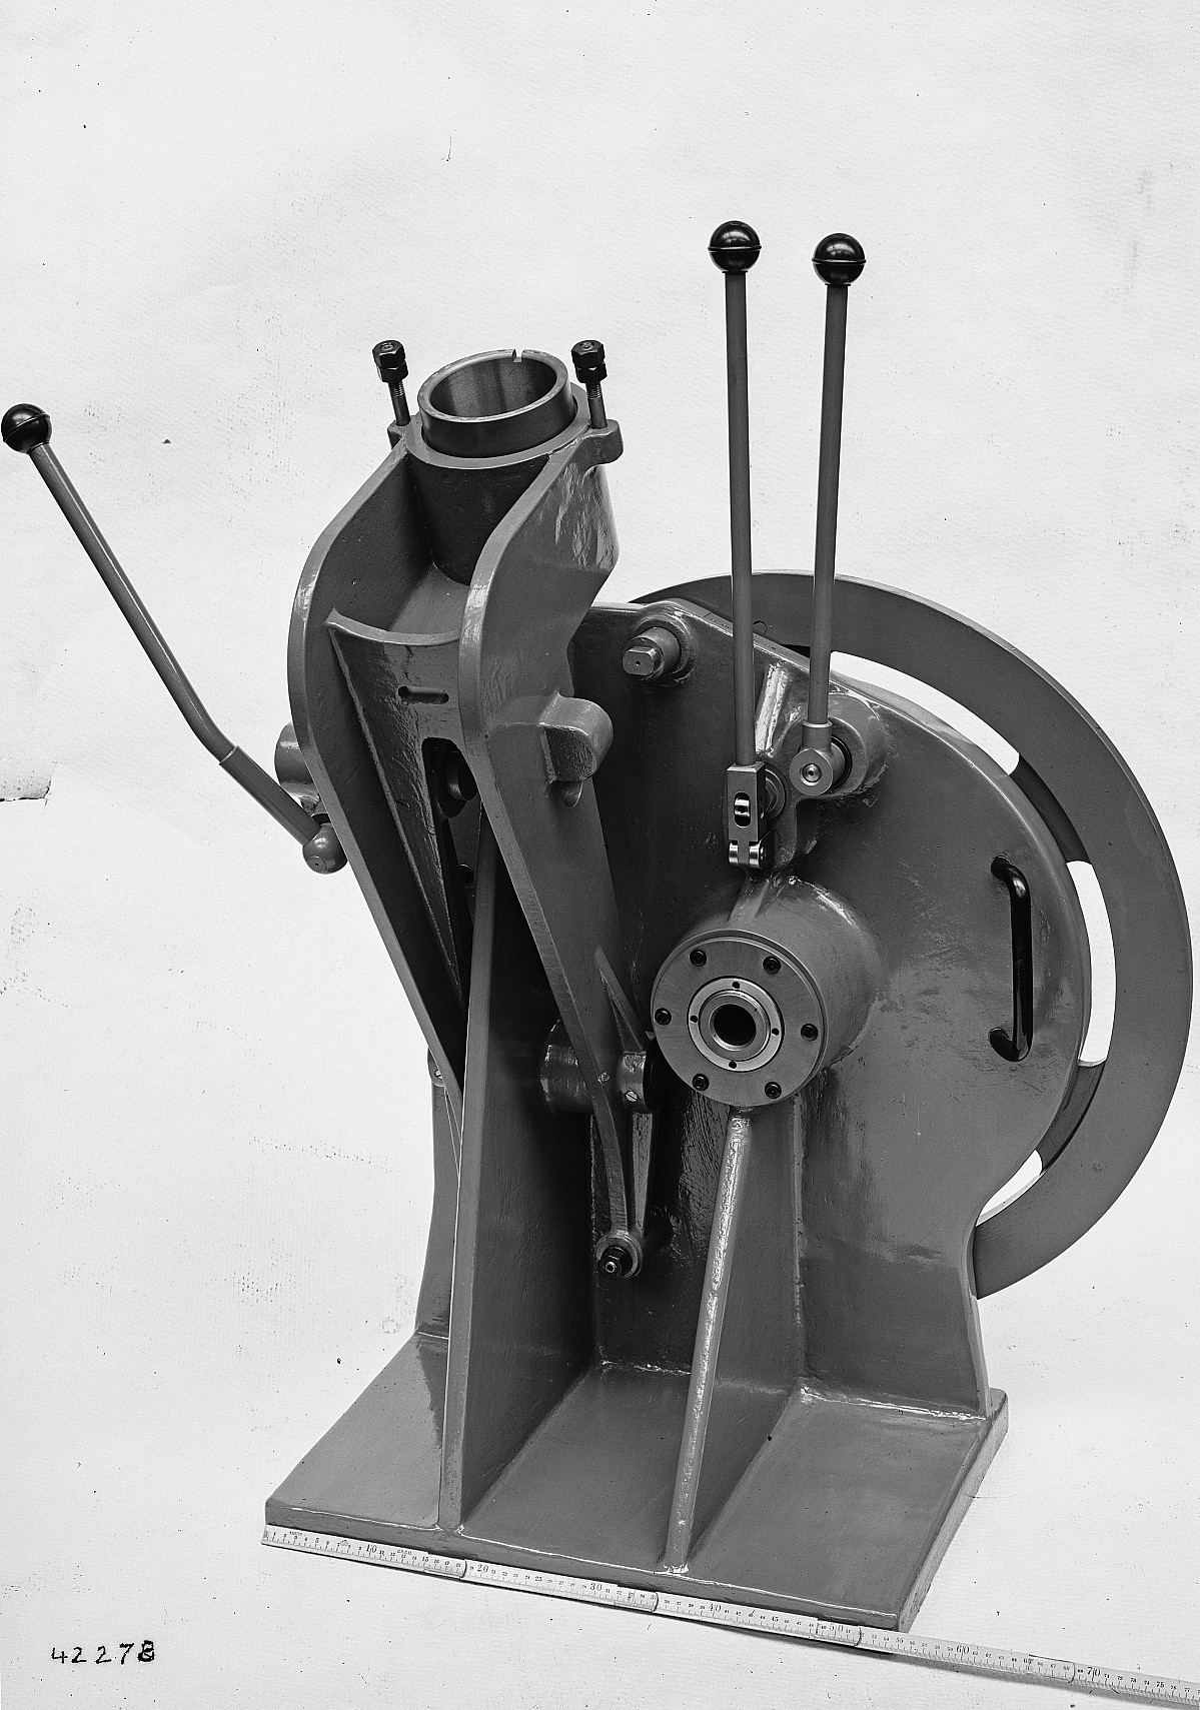 GFA 16/42278: Drilling jig